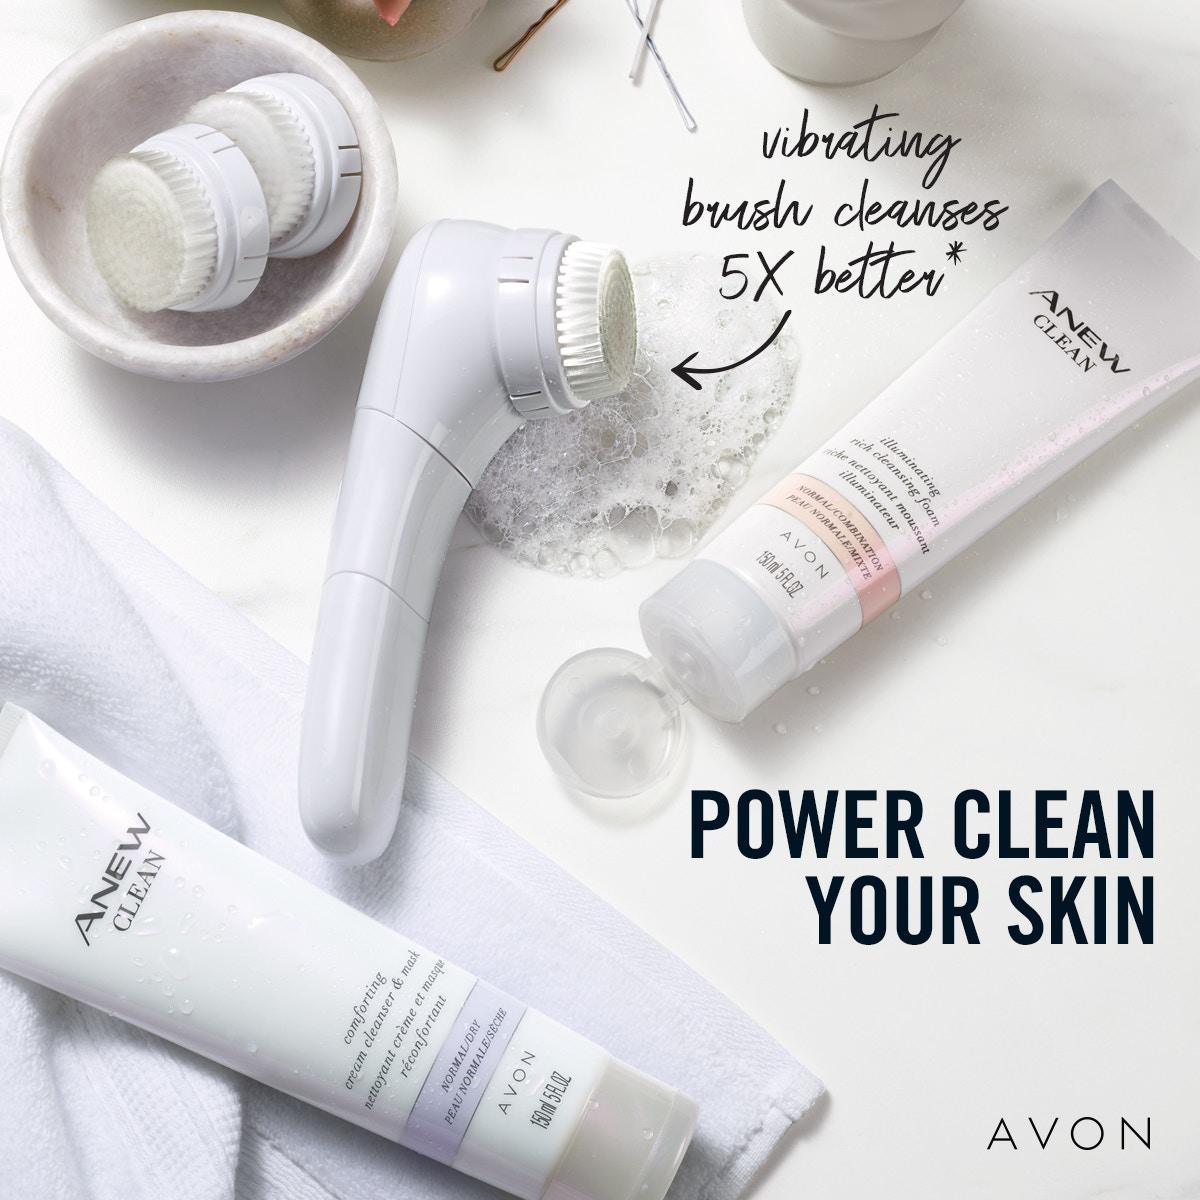 Power Clean Your Skin  http://go.youravon.com/3jq724  http://go.youravon.com/3jq725pic.twitter.com/STc1IHtxal